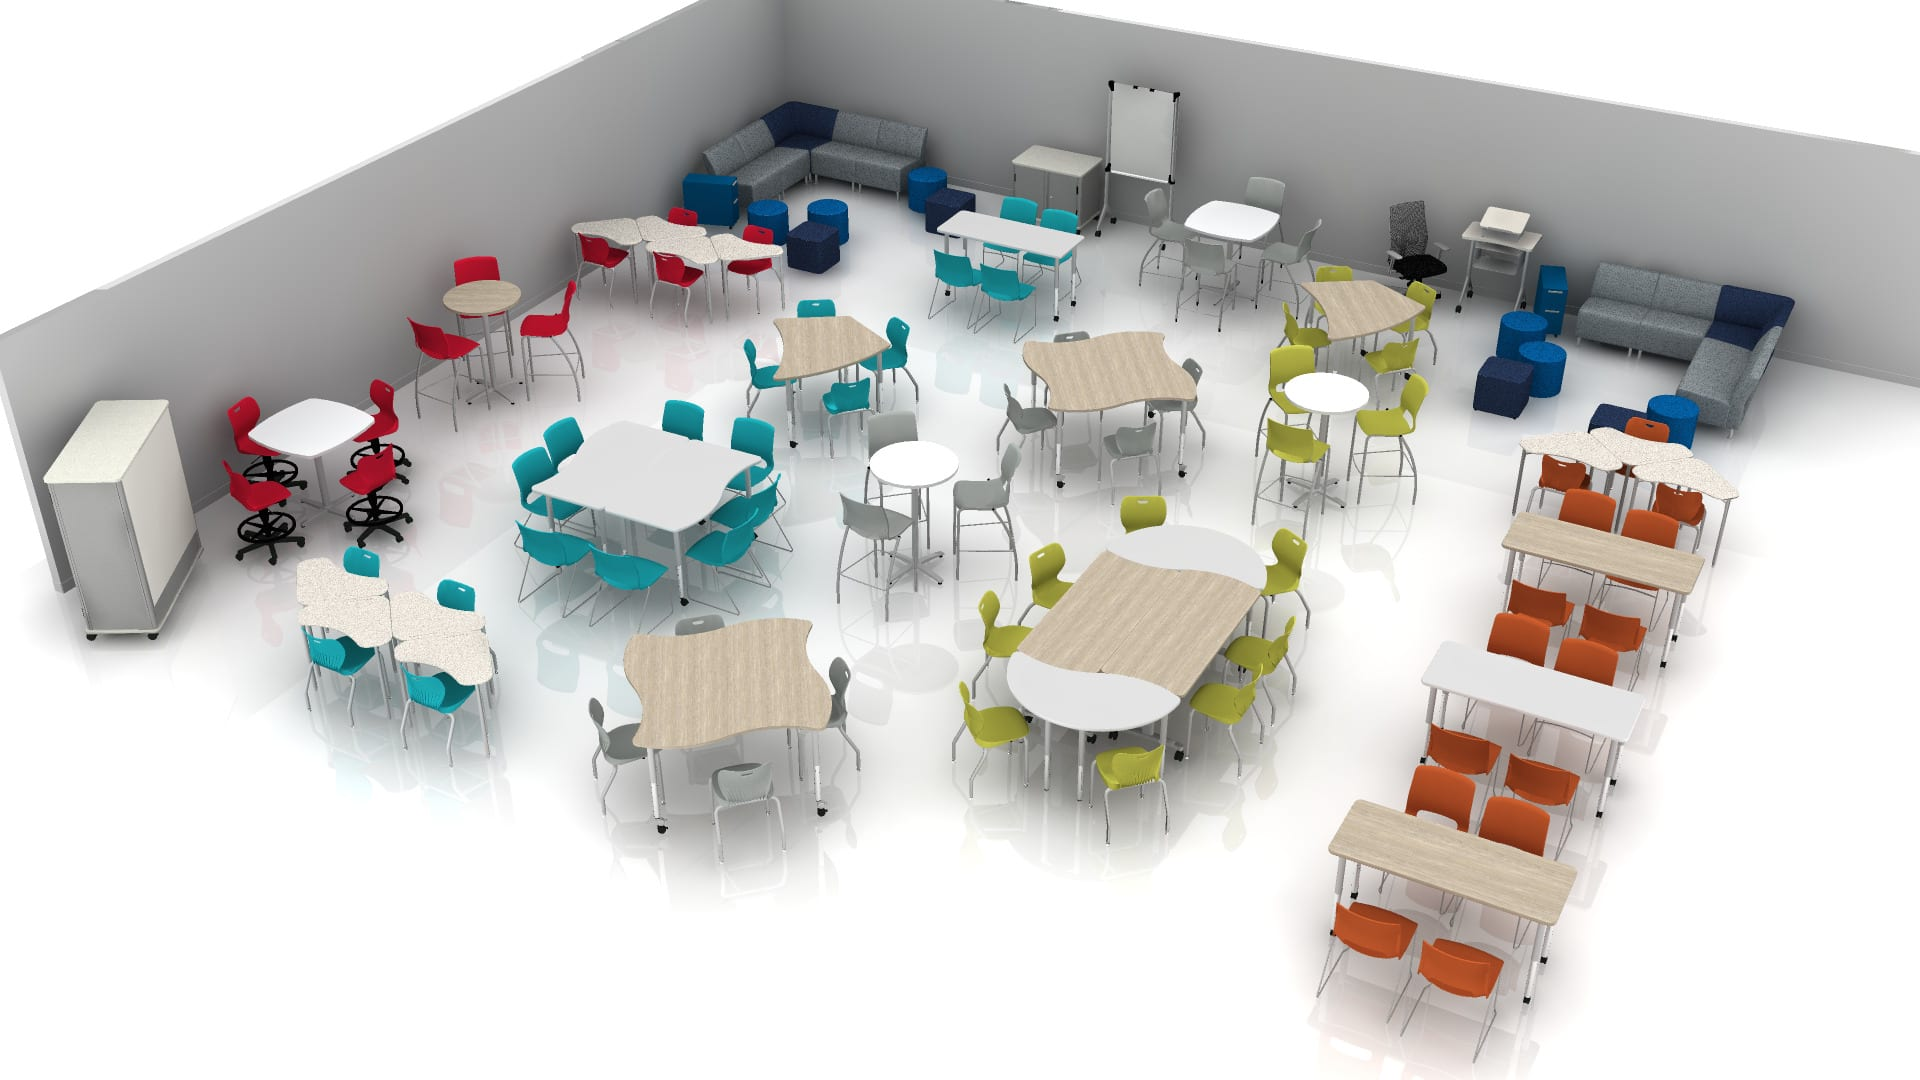 EDUCATION_SOCIAL_CAFE_02C